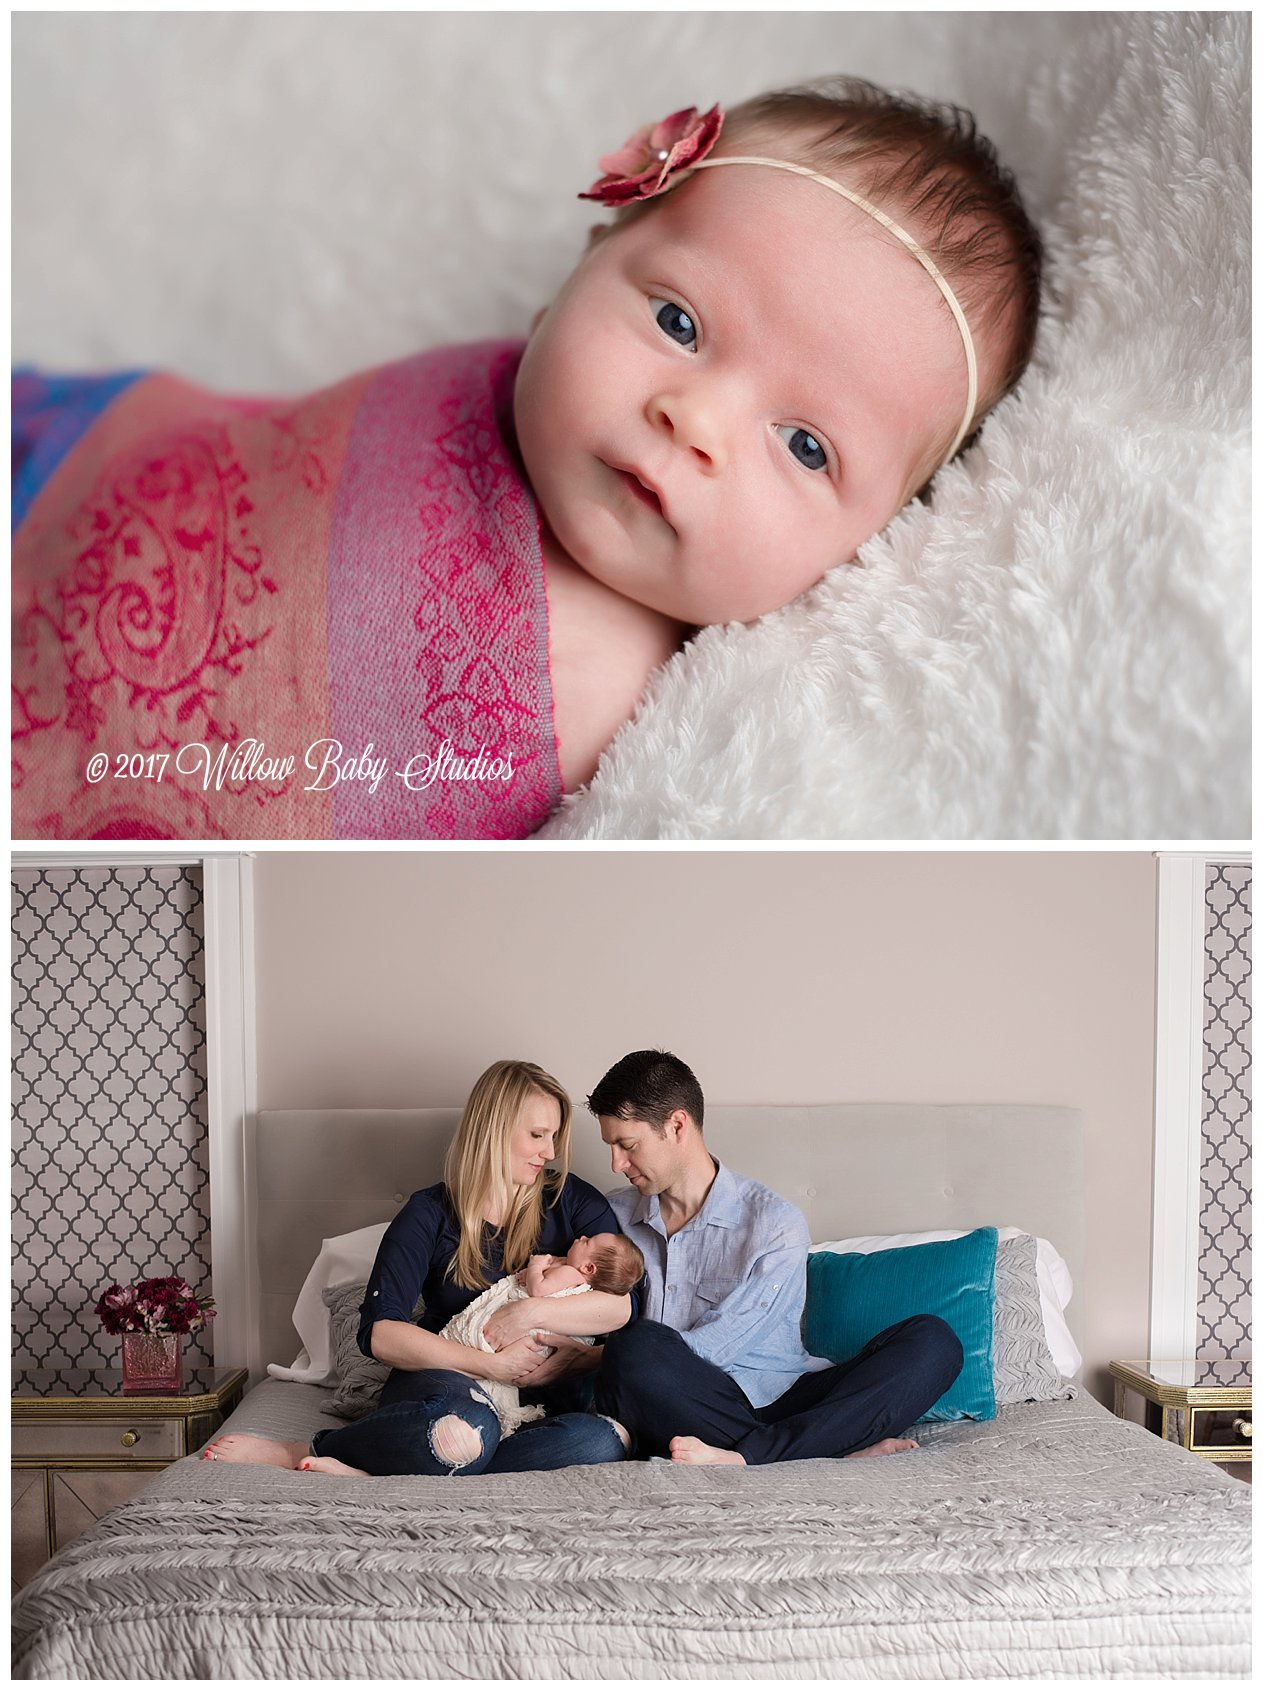 set of two photos awake newborn staring at the camera and parents gazing at their newborn baby